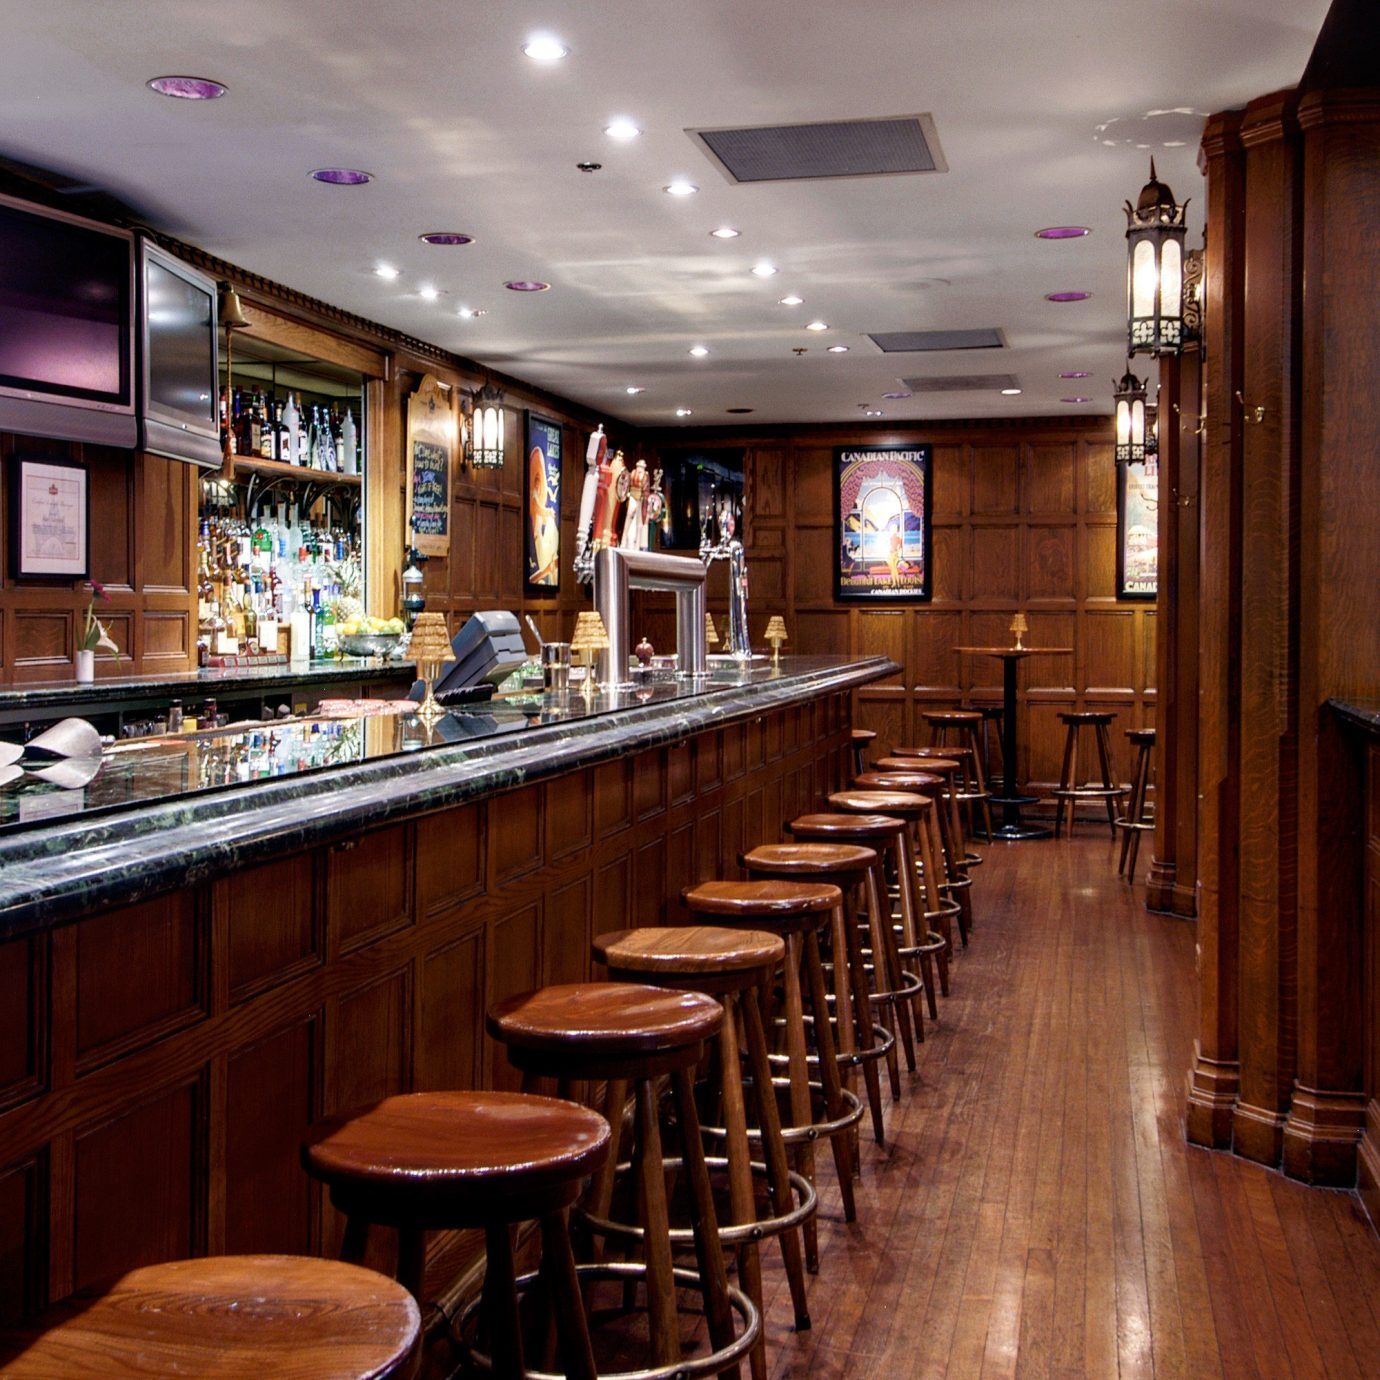 Bar Dining Drink Eat Resort Kitchen restaurant café coffeehouse stainless steel appliance Island